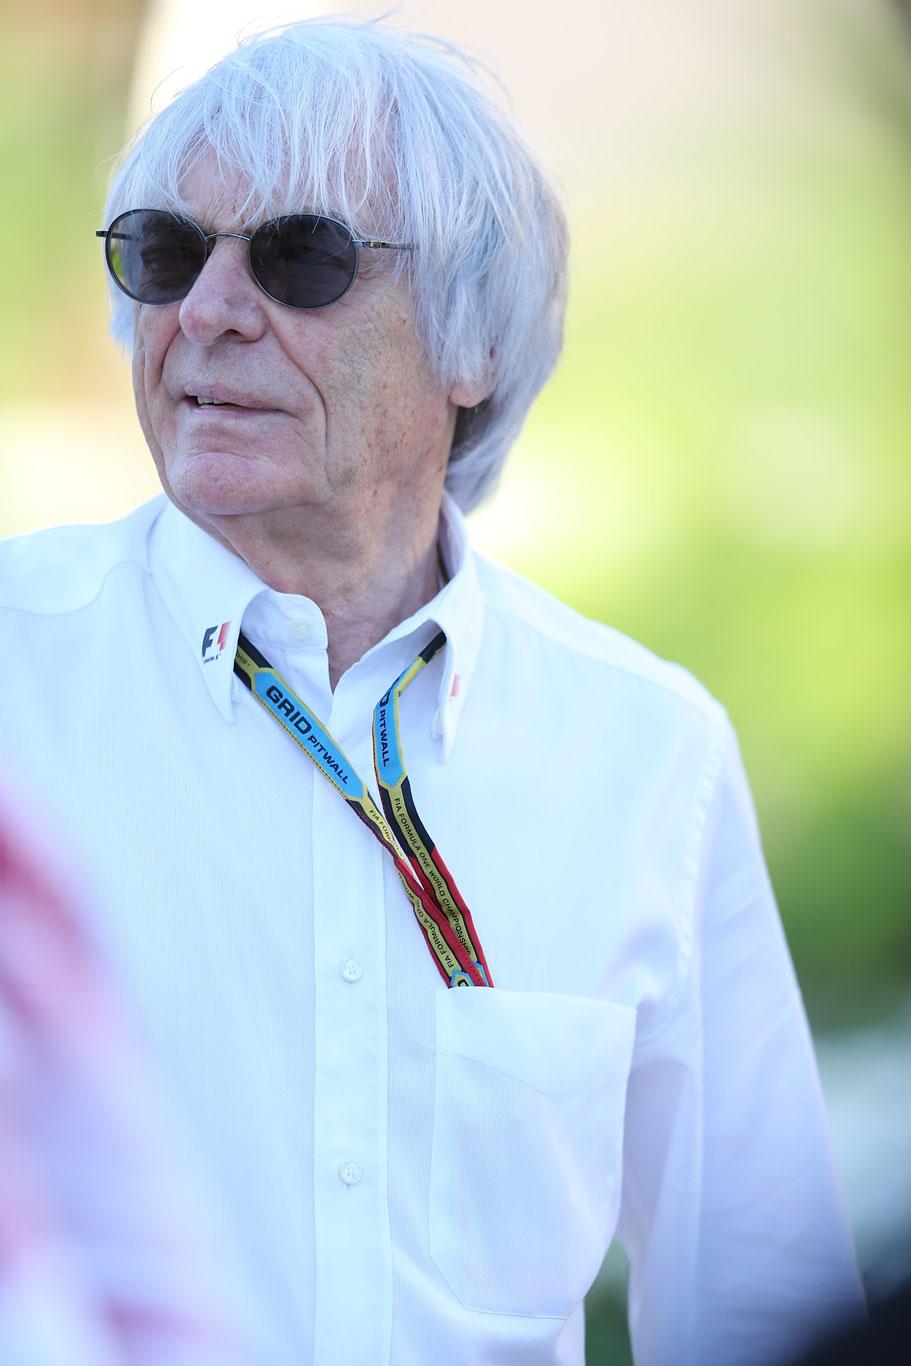 Bernie Ecclestone ousted as Formula 1 Chief thumbnail